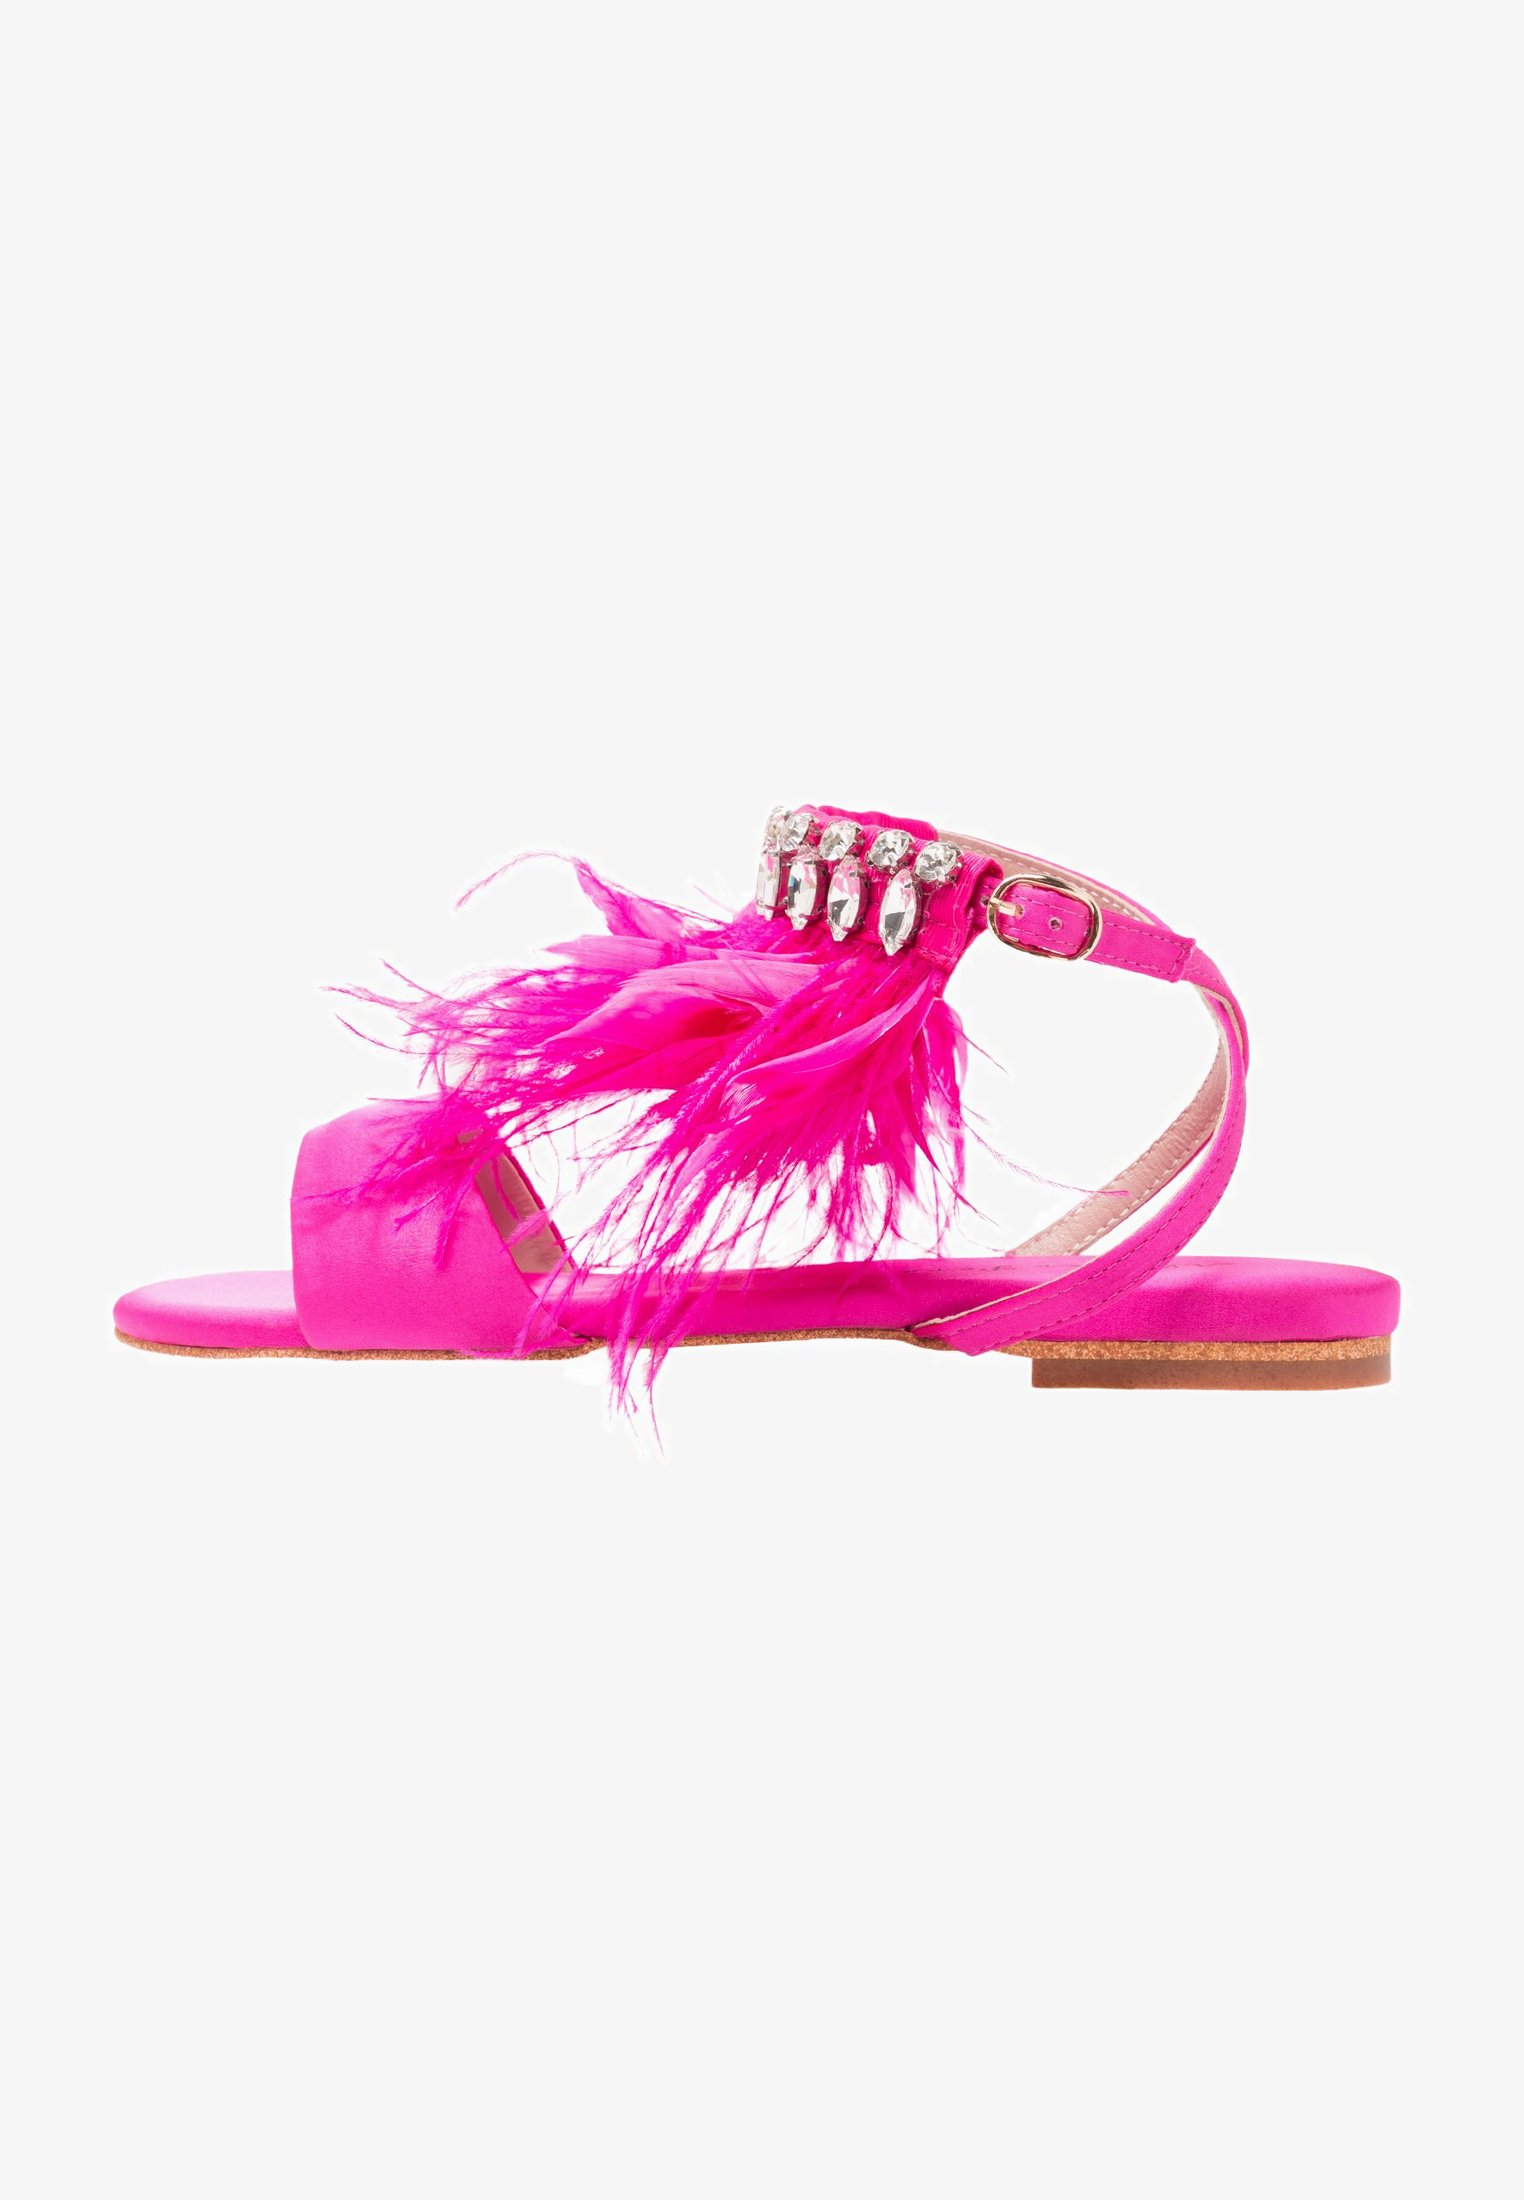 sandali piatti colorati - Shoeplay Fashion blog di scarpe da donna 6a1ee5ba4fd